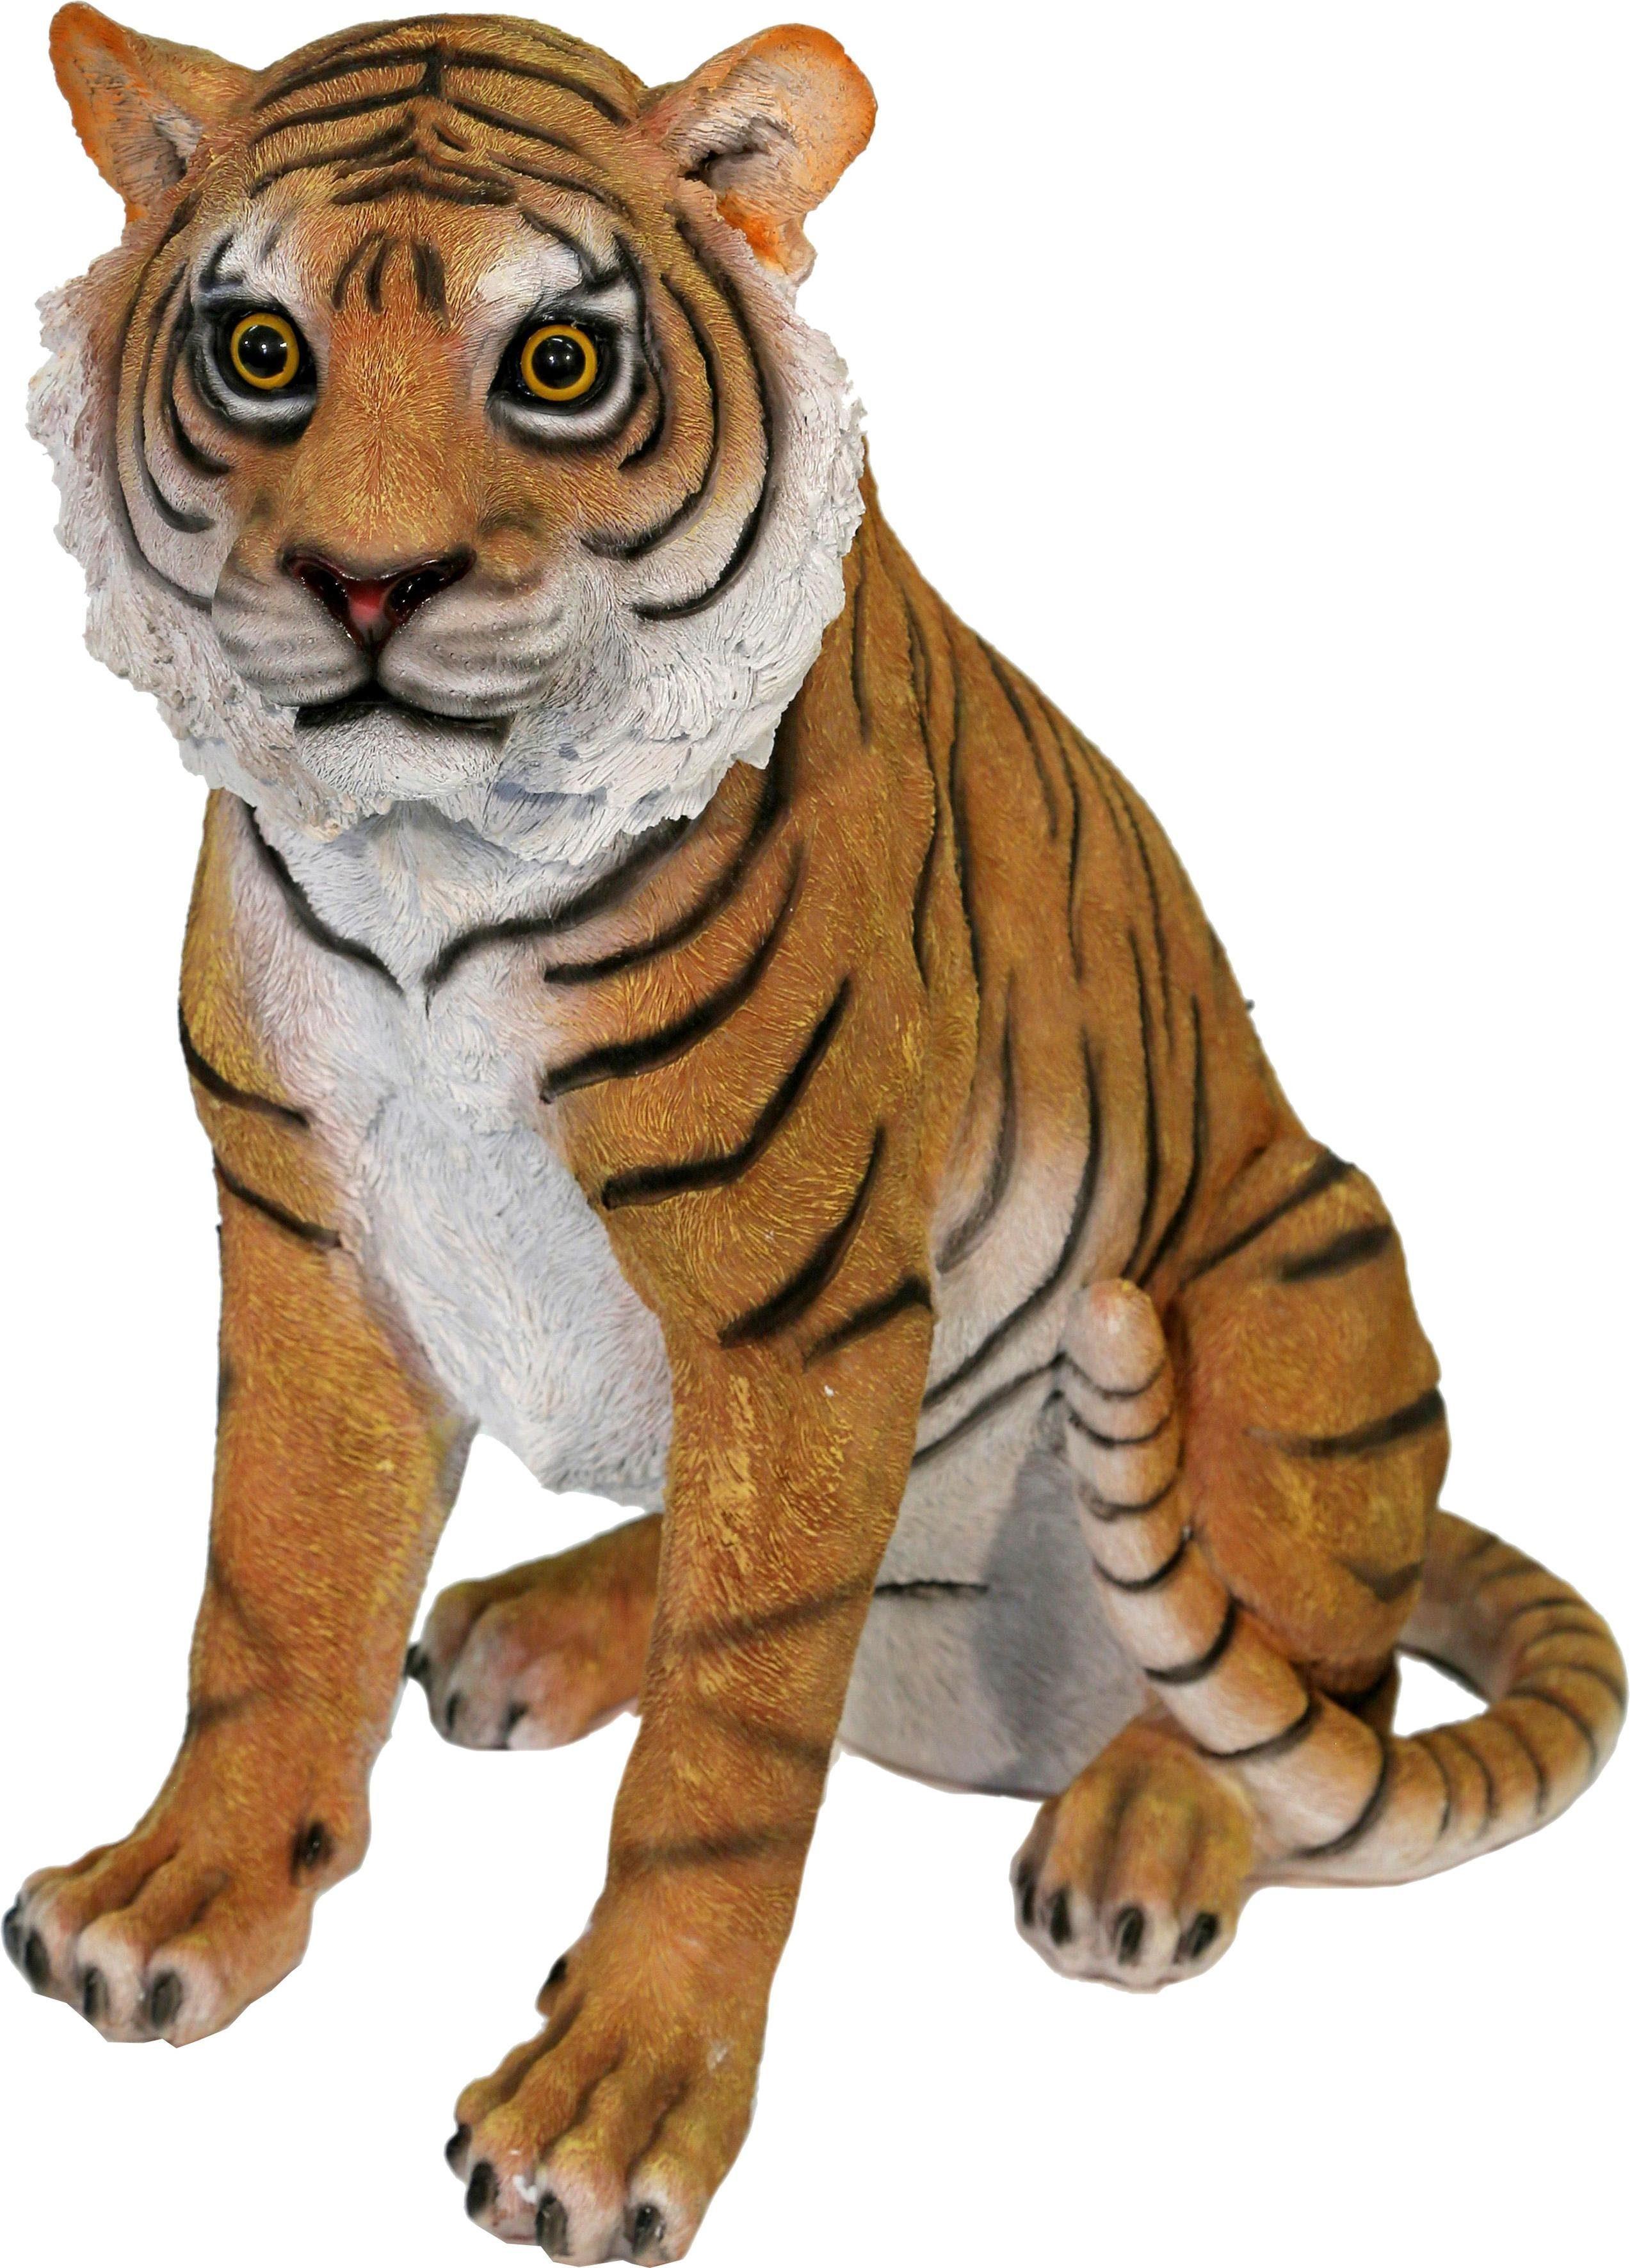 Home affaire Dekofigur »Tiger sitzend«, Höhe 44 cm